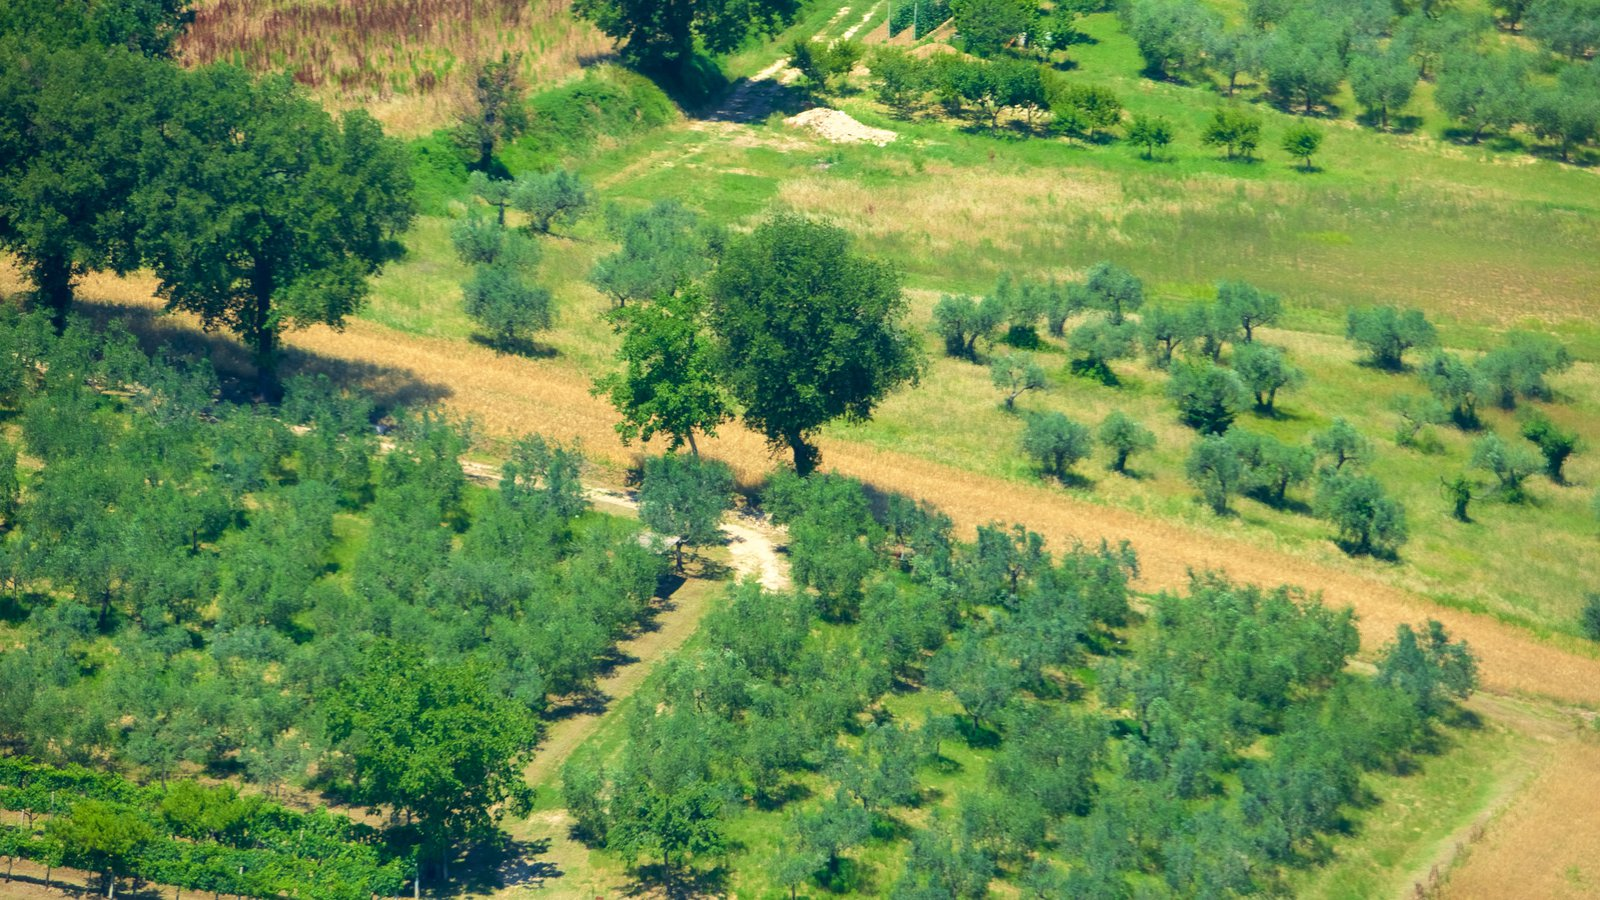 Montefalco featuring farmland